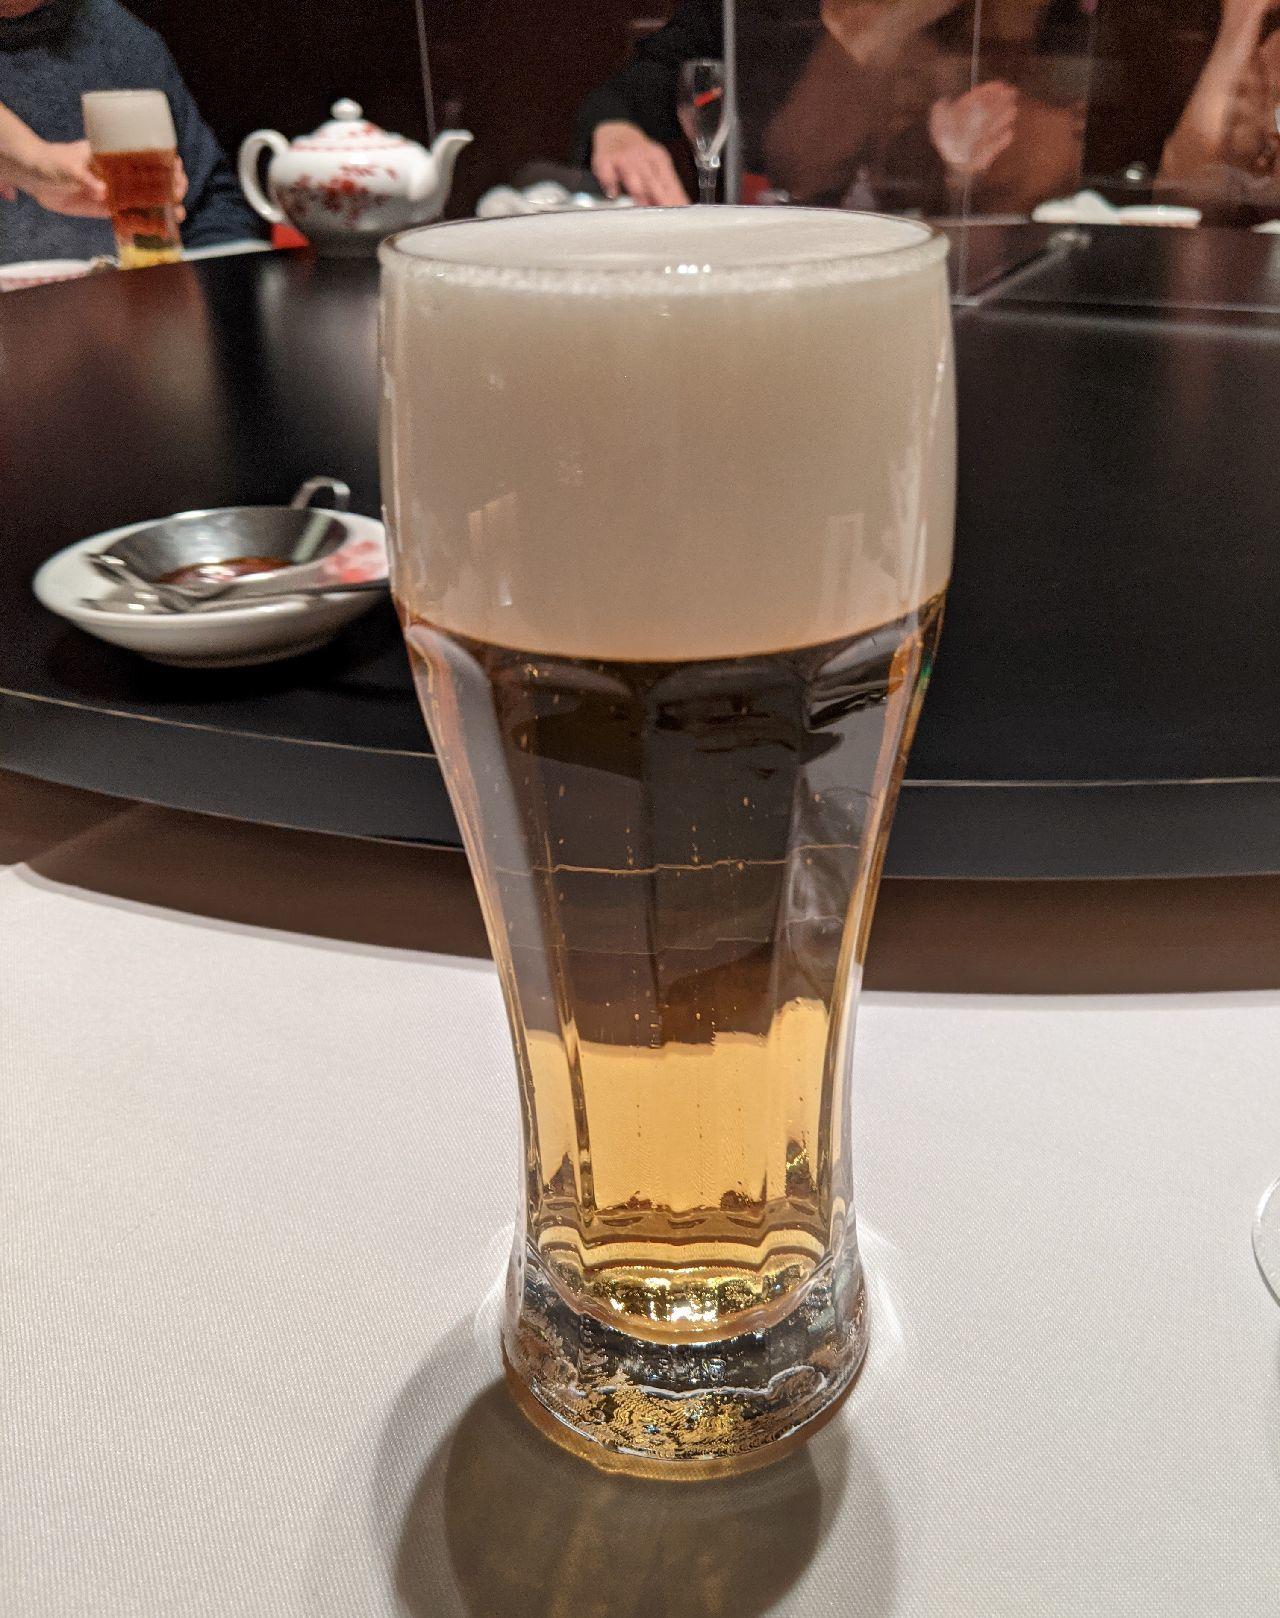 PXL_20201220_090948352生ビール